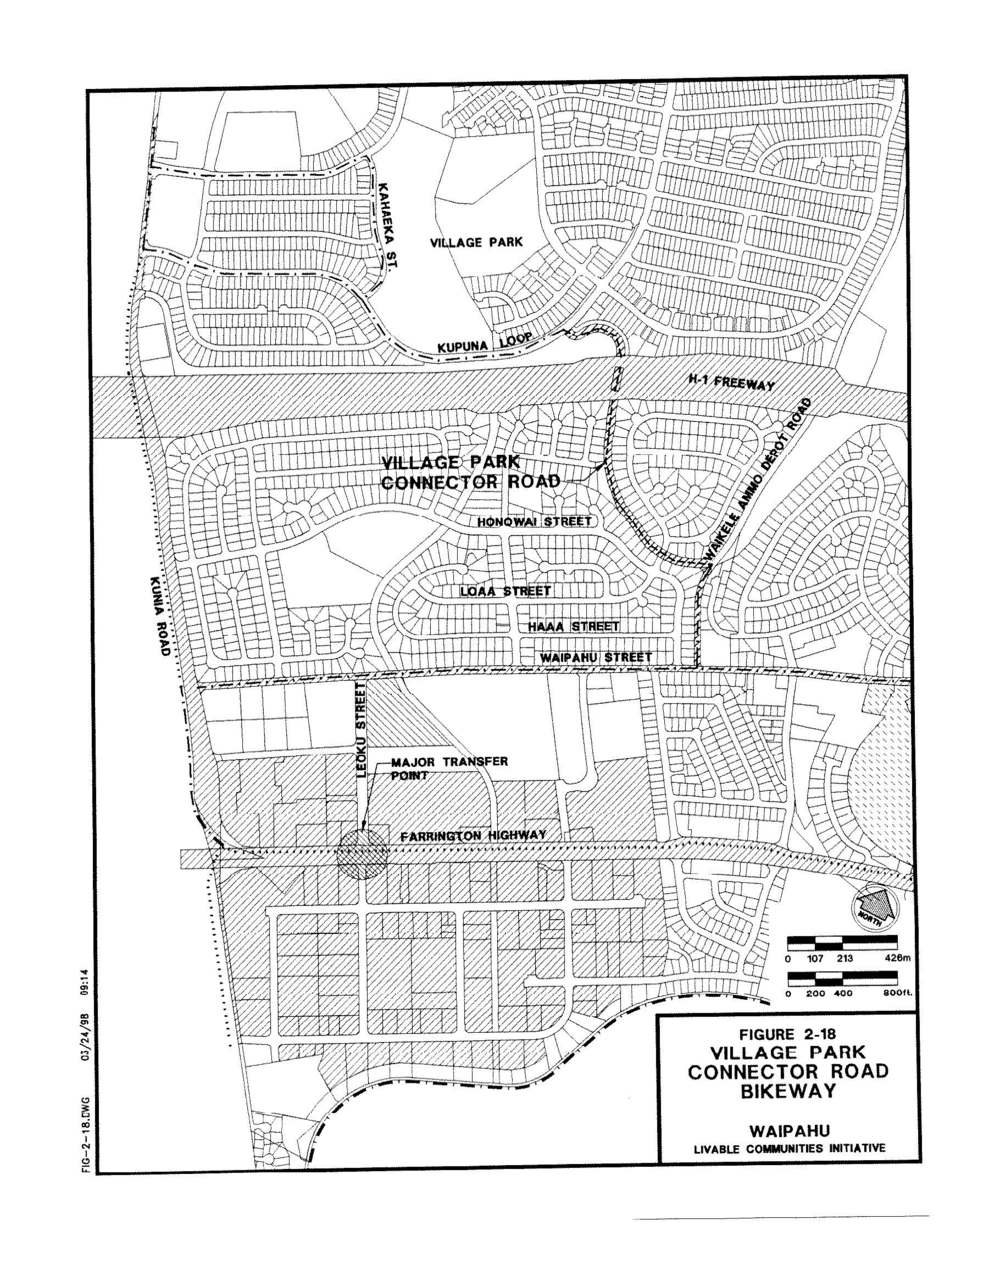 160531_WaipahuLivableCommunities(1998)_Page_074.jpg